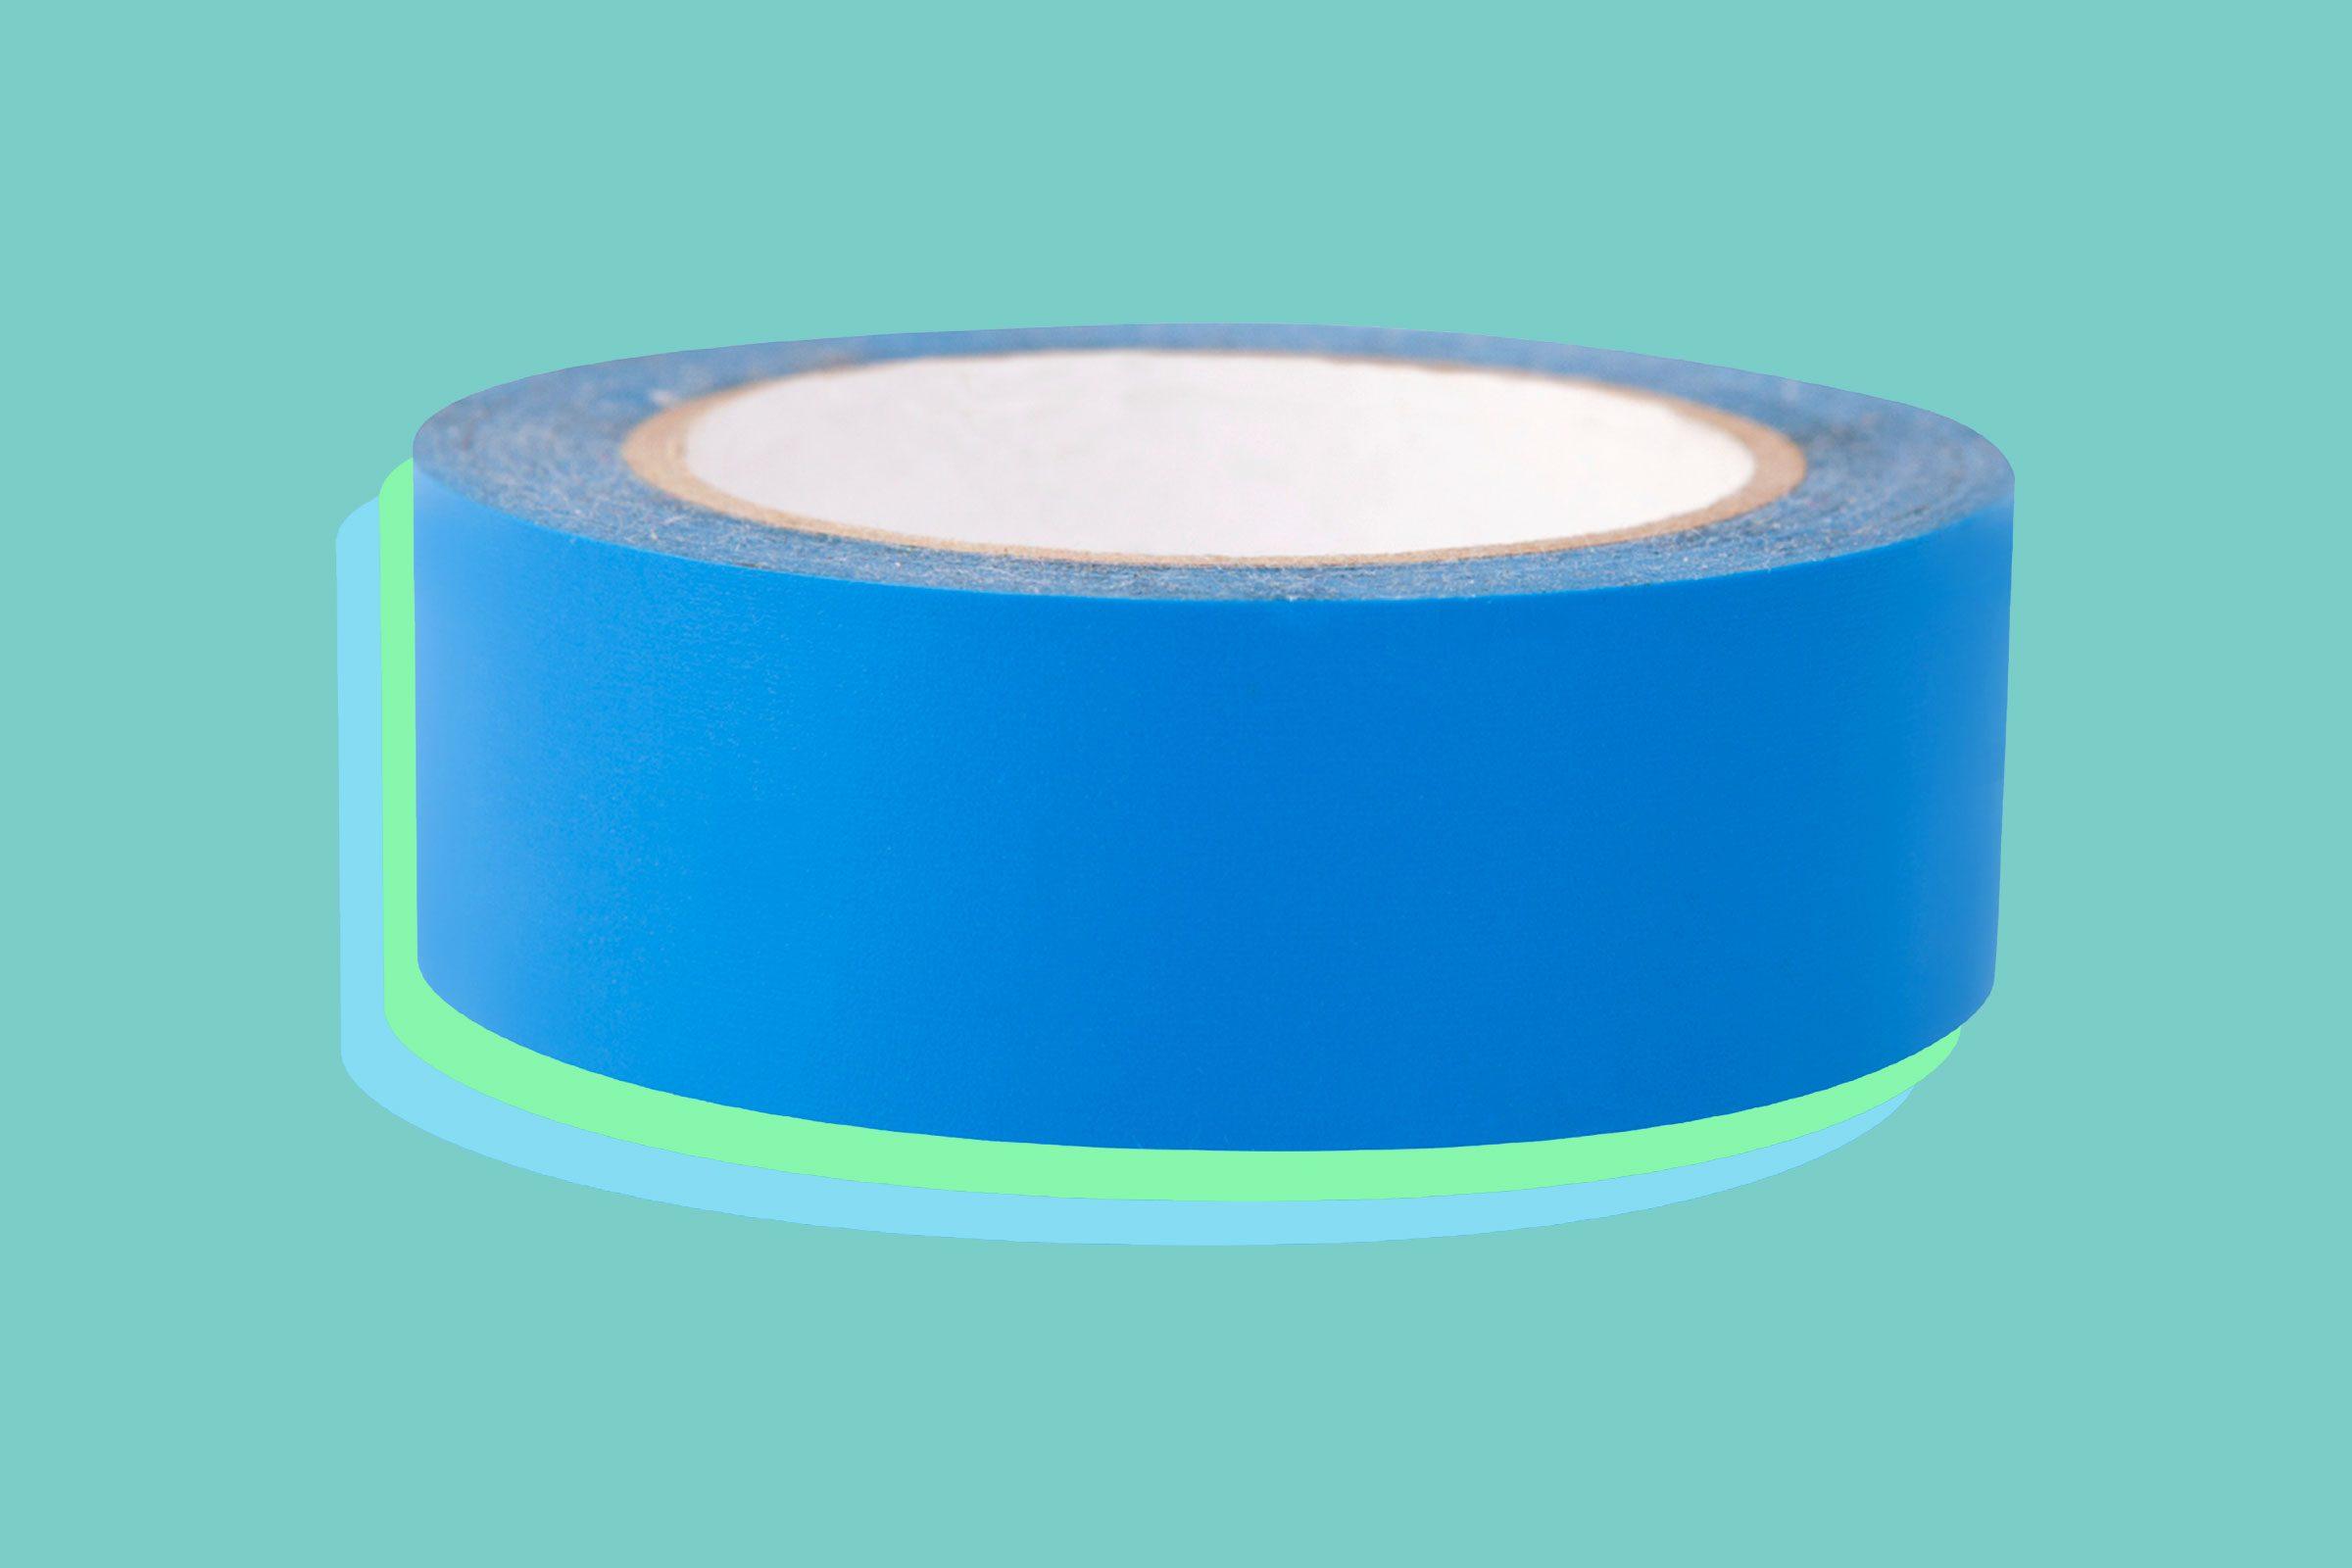 Use adhesive tape to remove a splinter